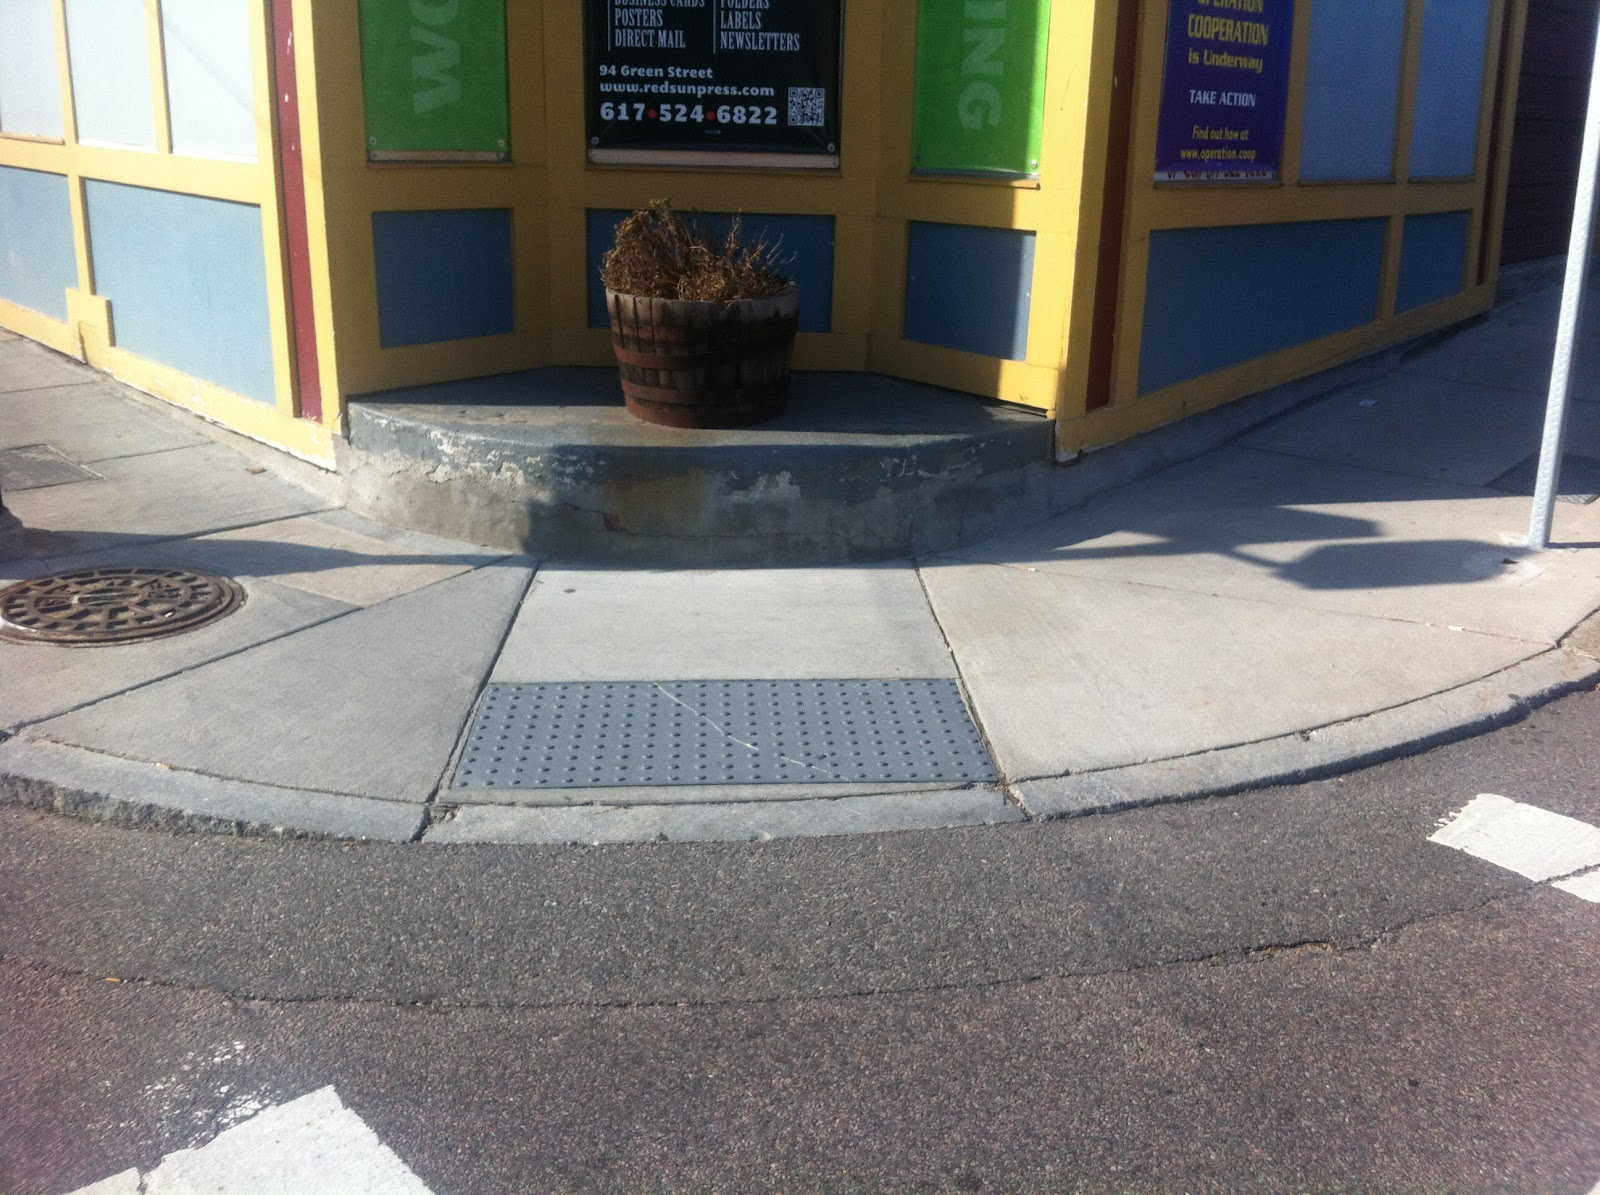 Calm Streets Boston Ada Curb Ramps